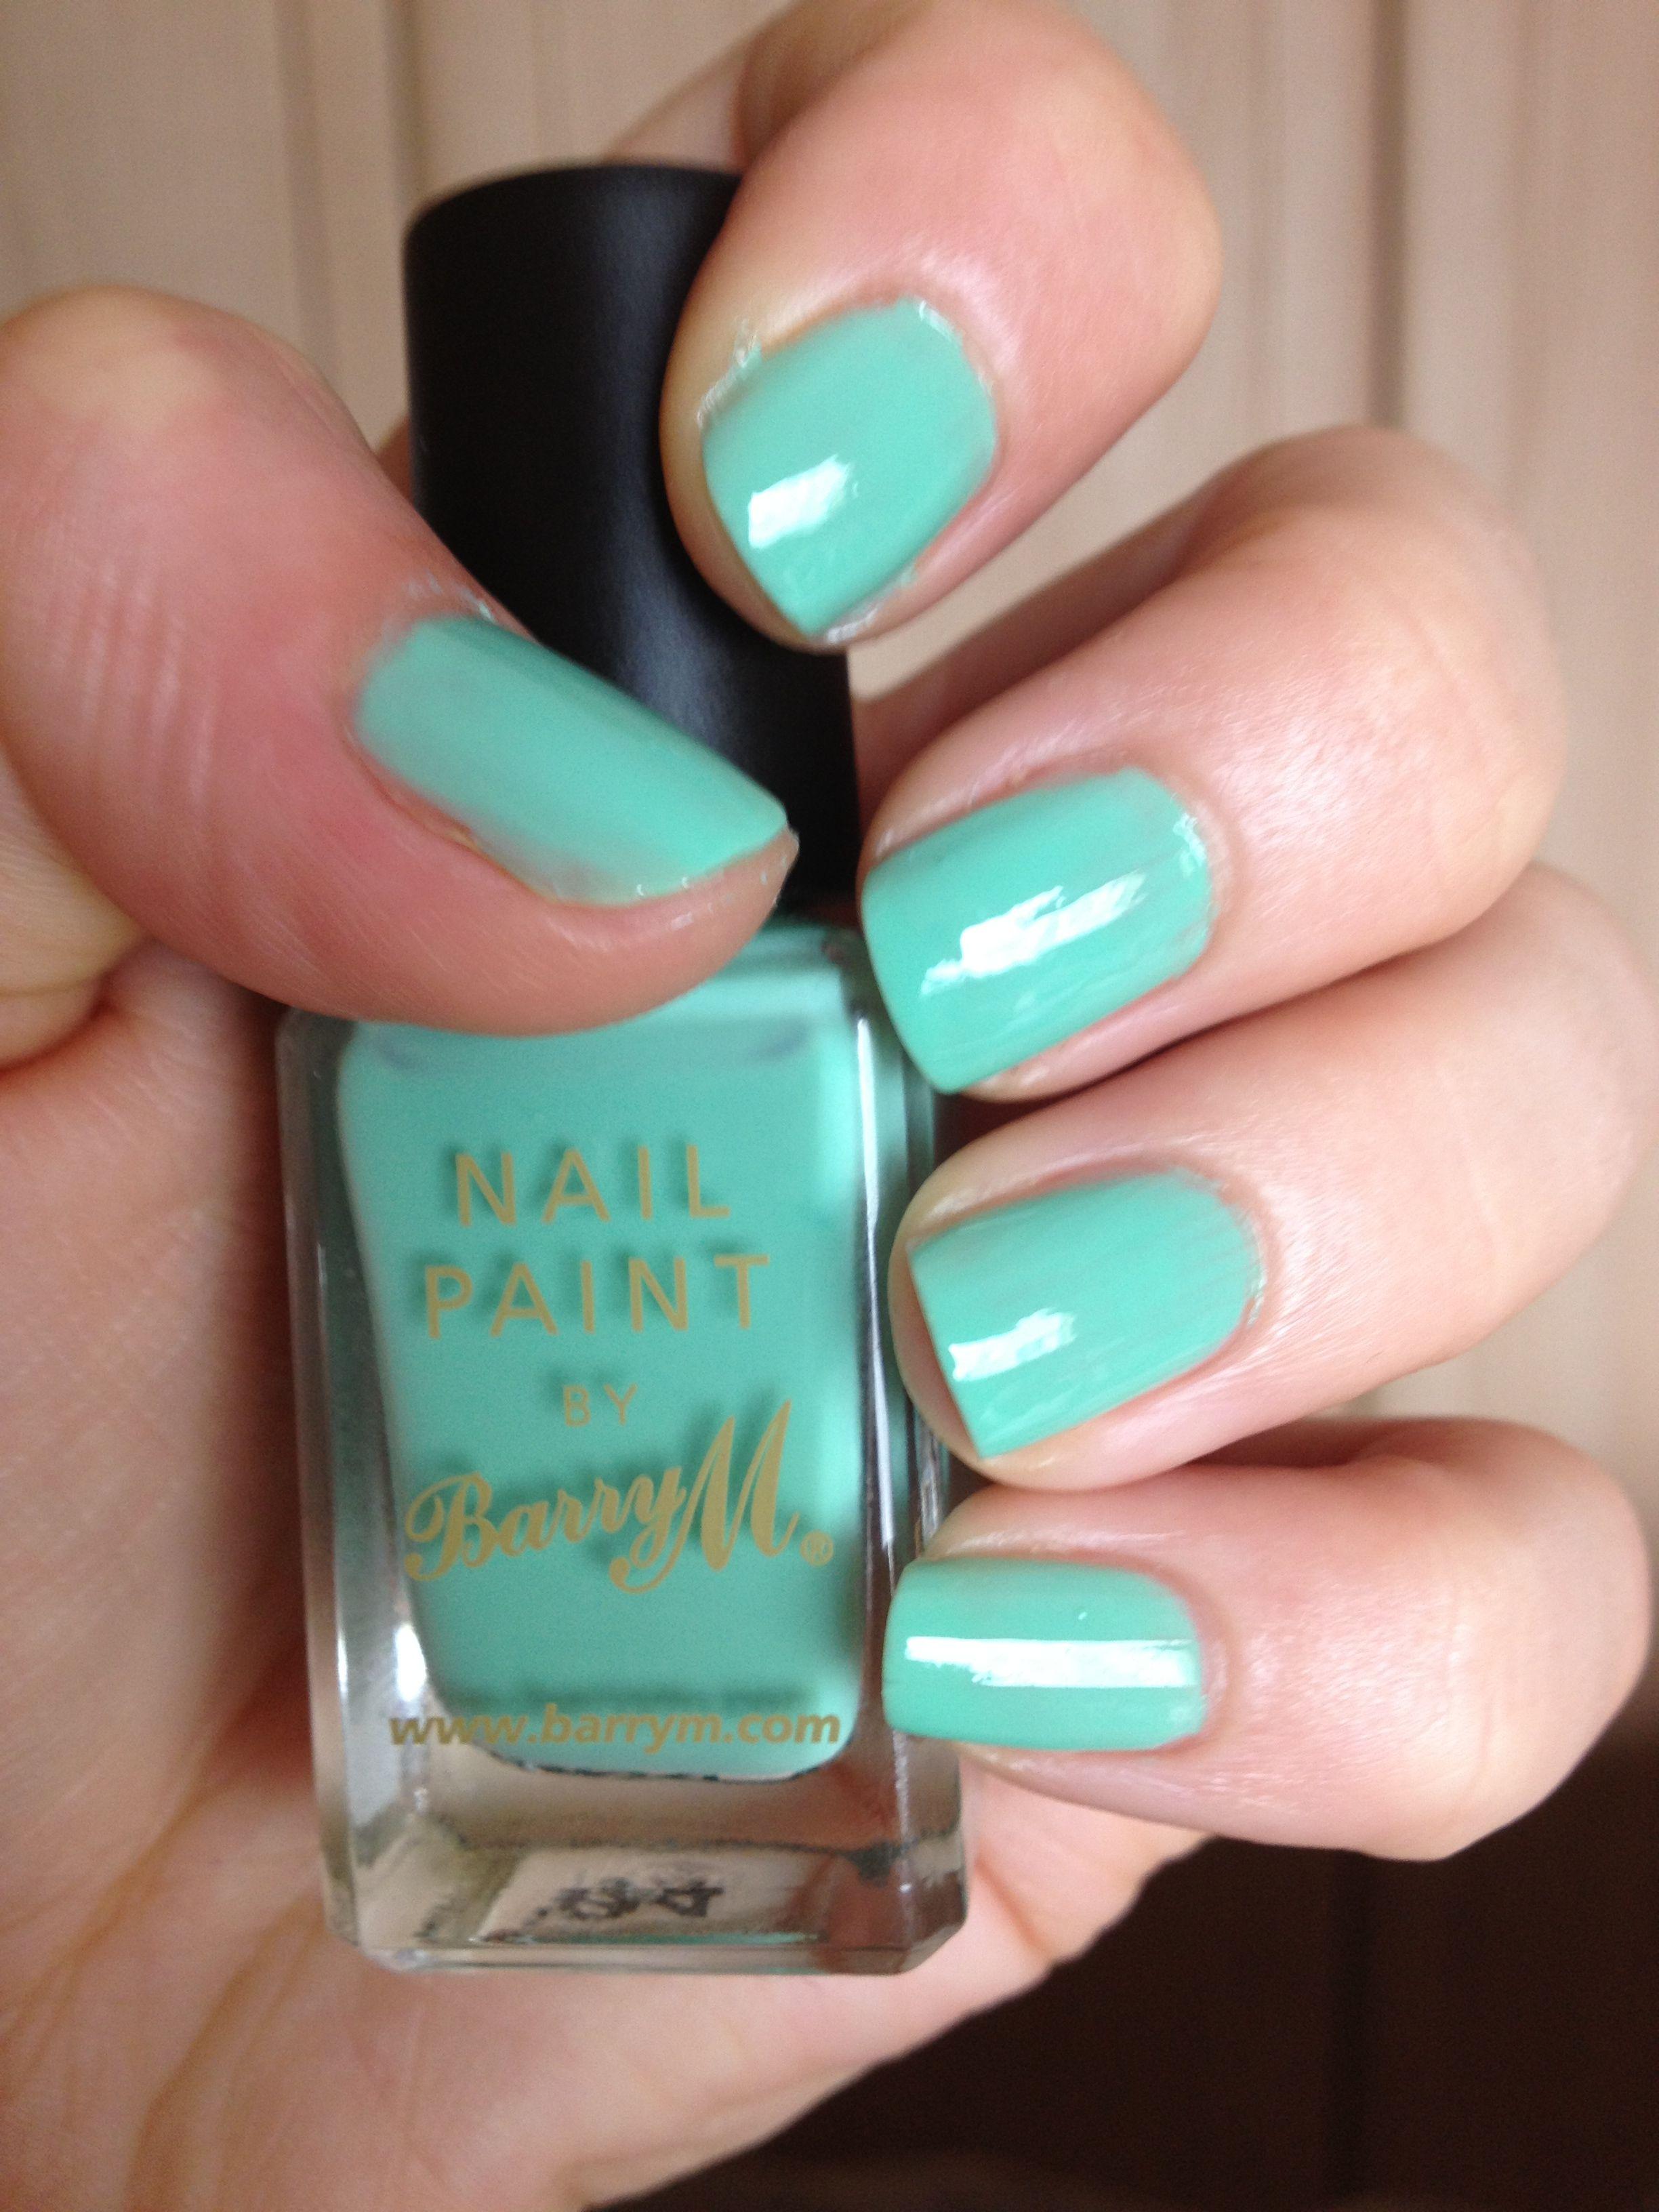 Barrym mint green nails pinterest mint green